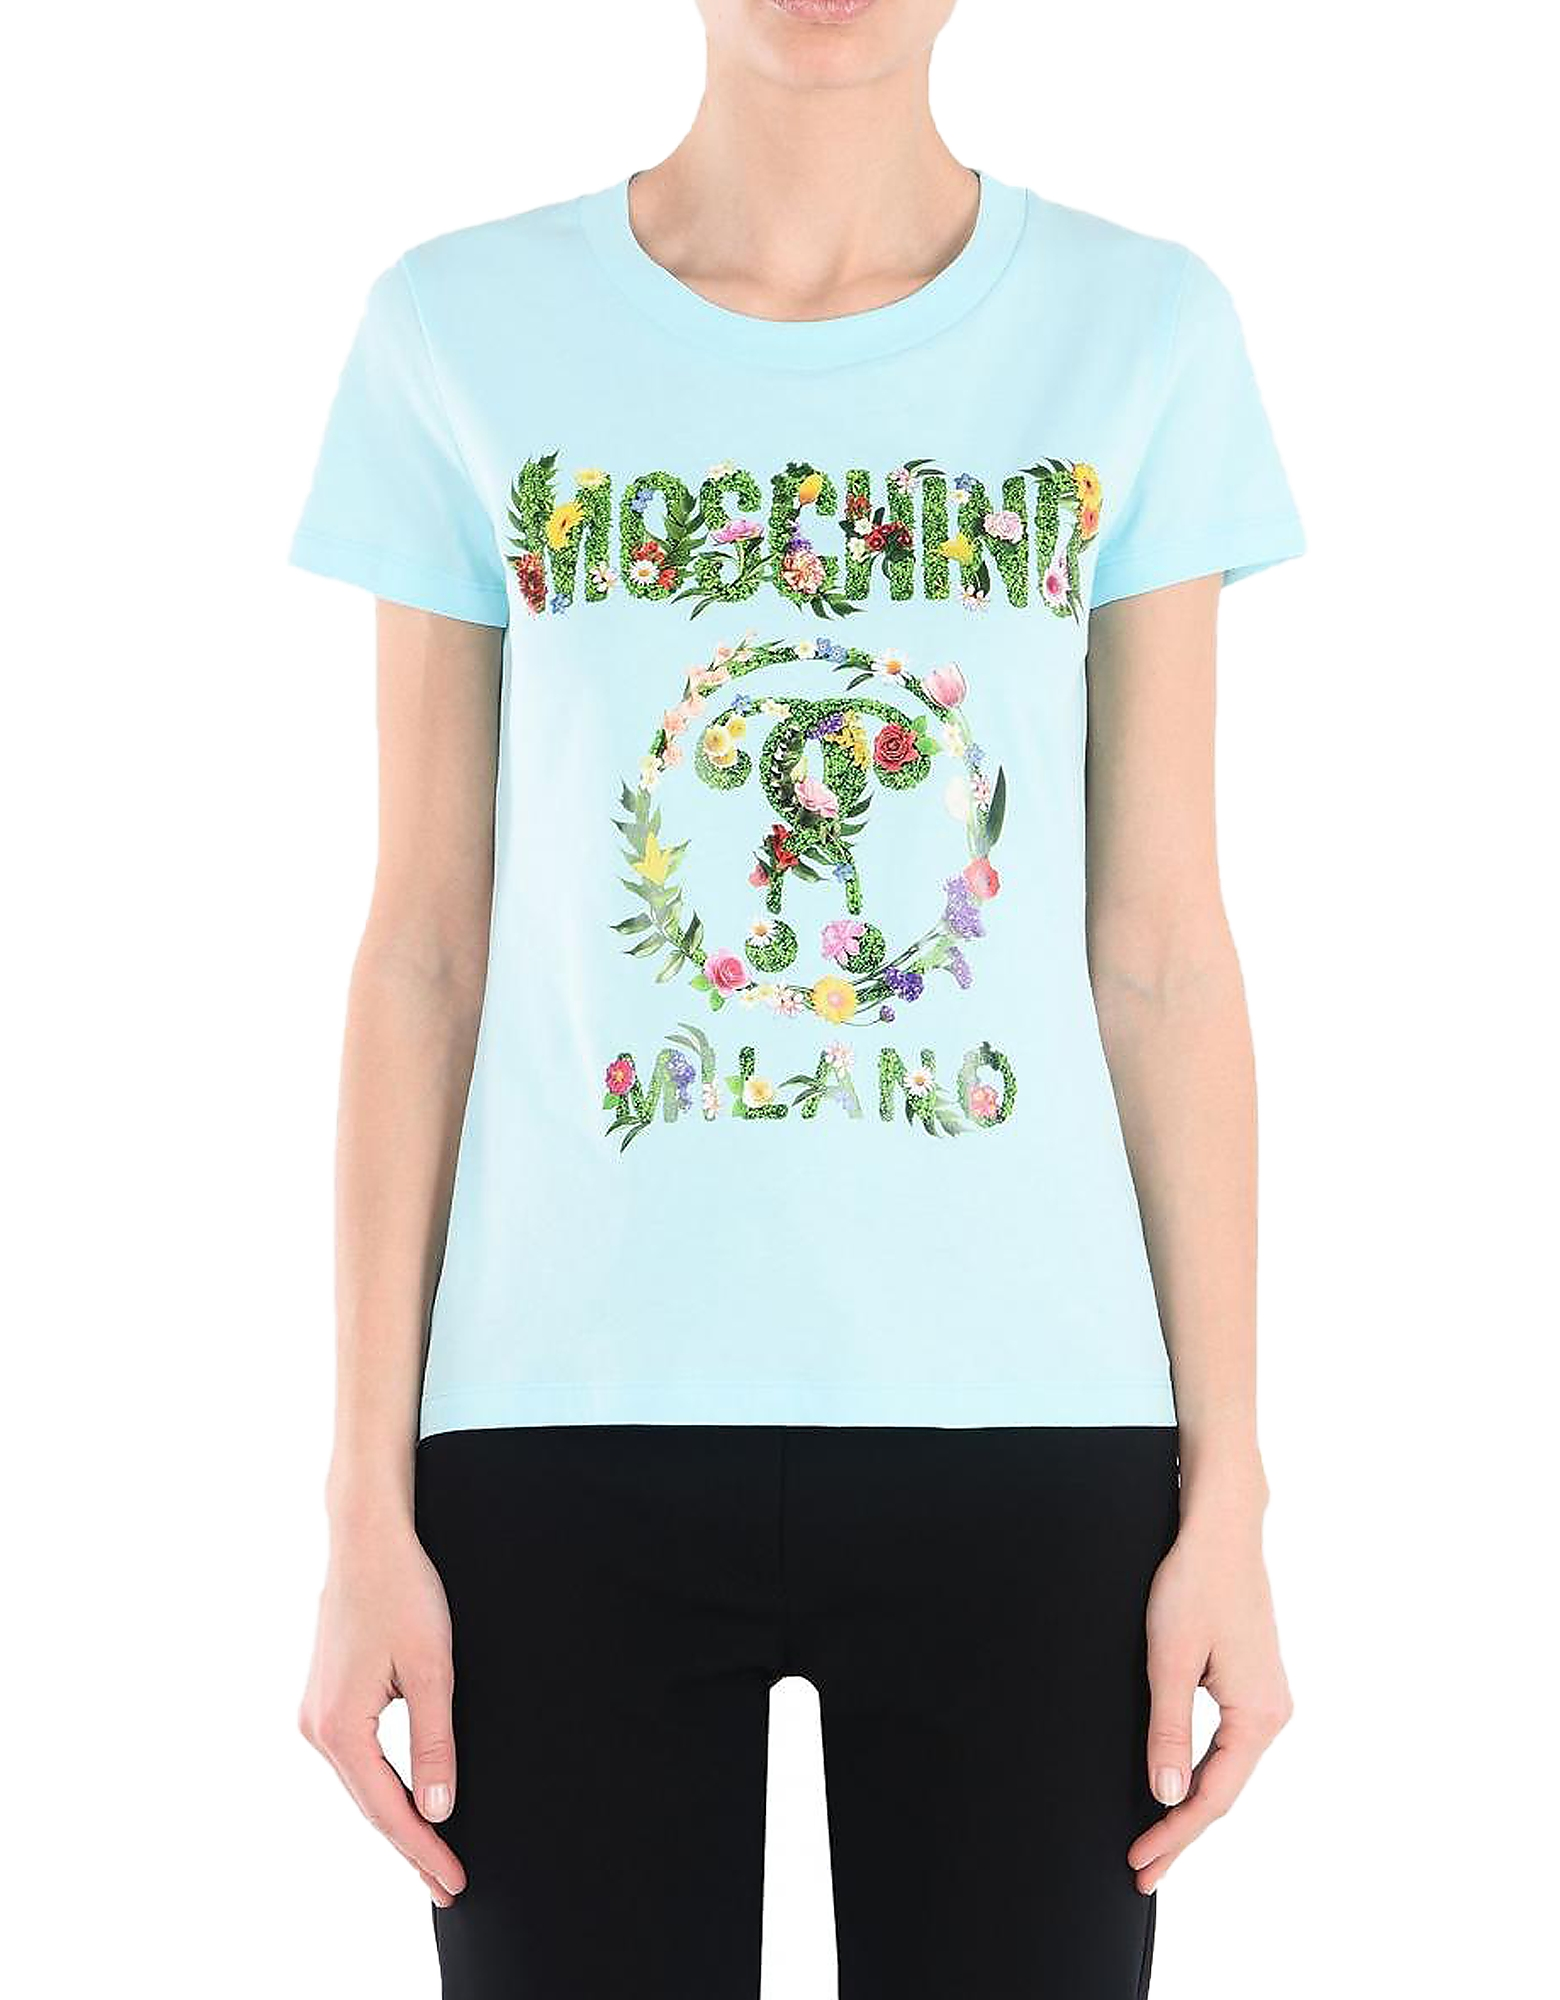 Moschino Designer T-Shirts & Tops, Floral Print Sky Blue Cotton Women's T-Shirt